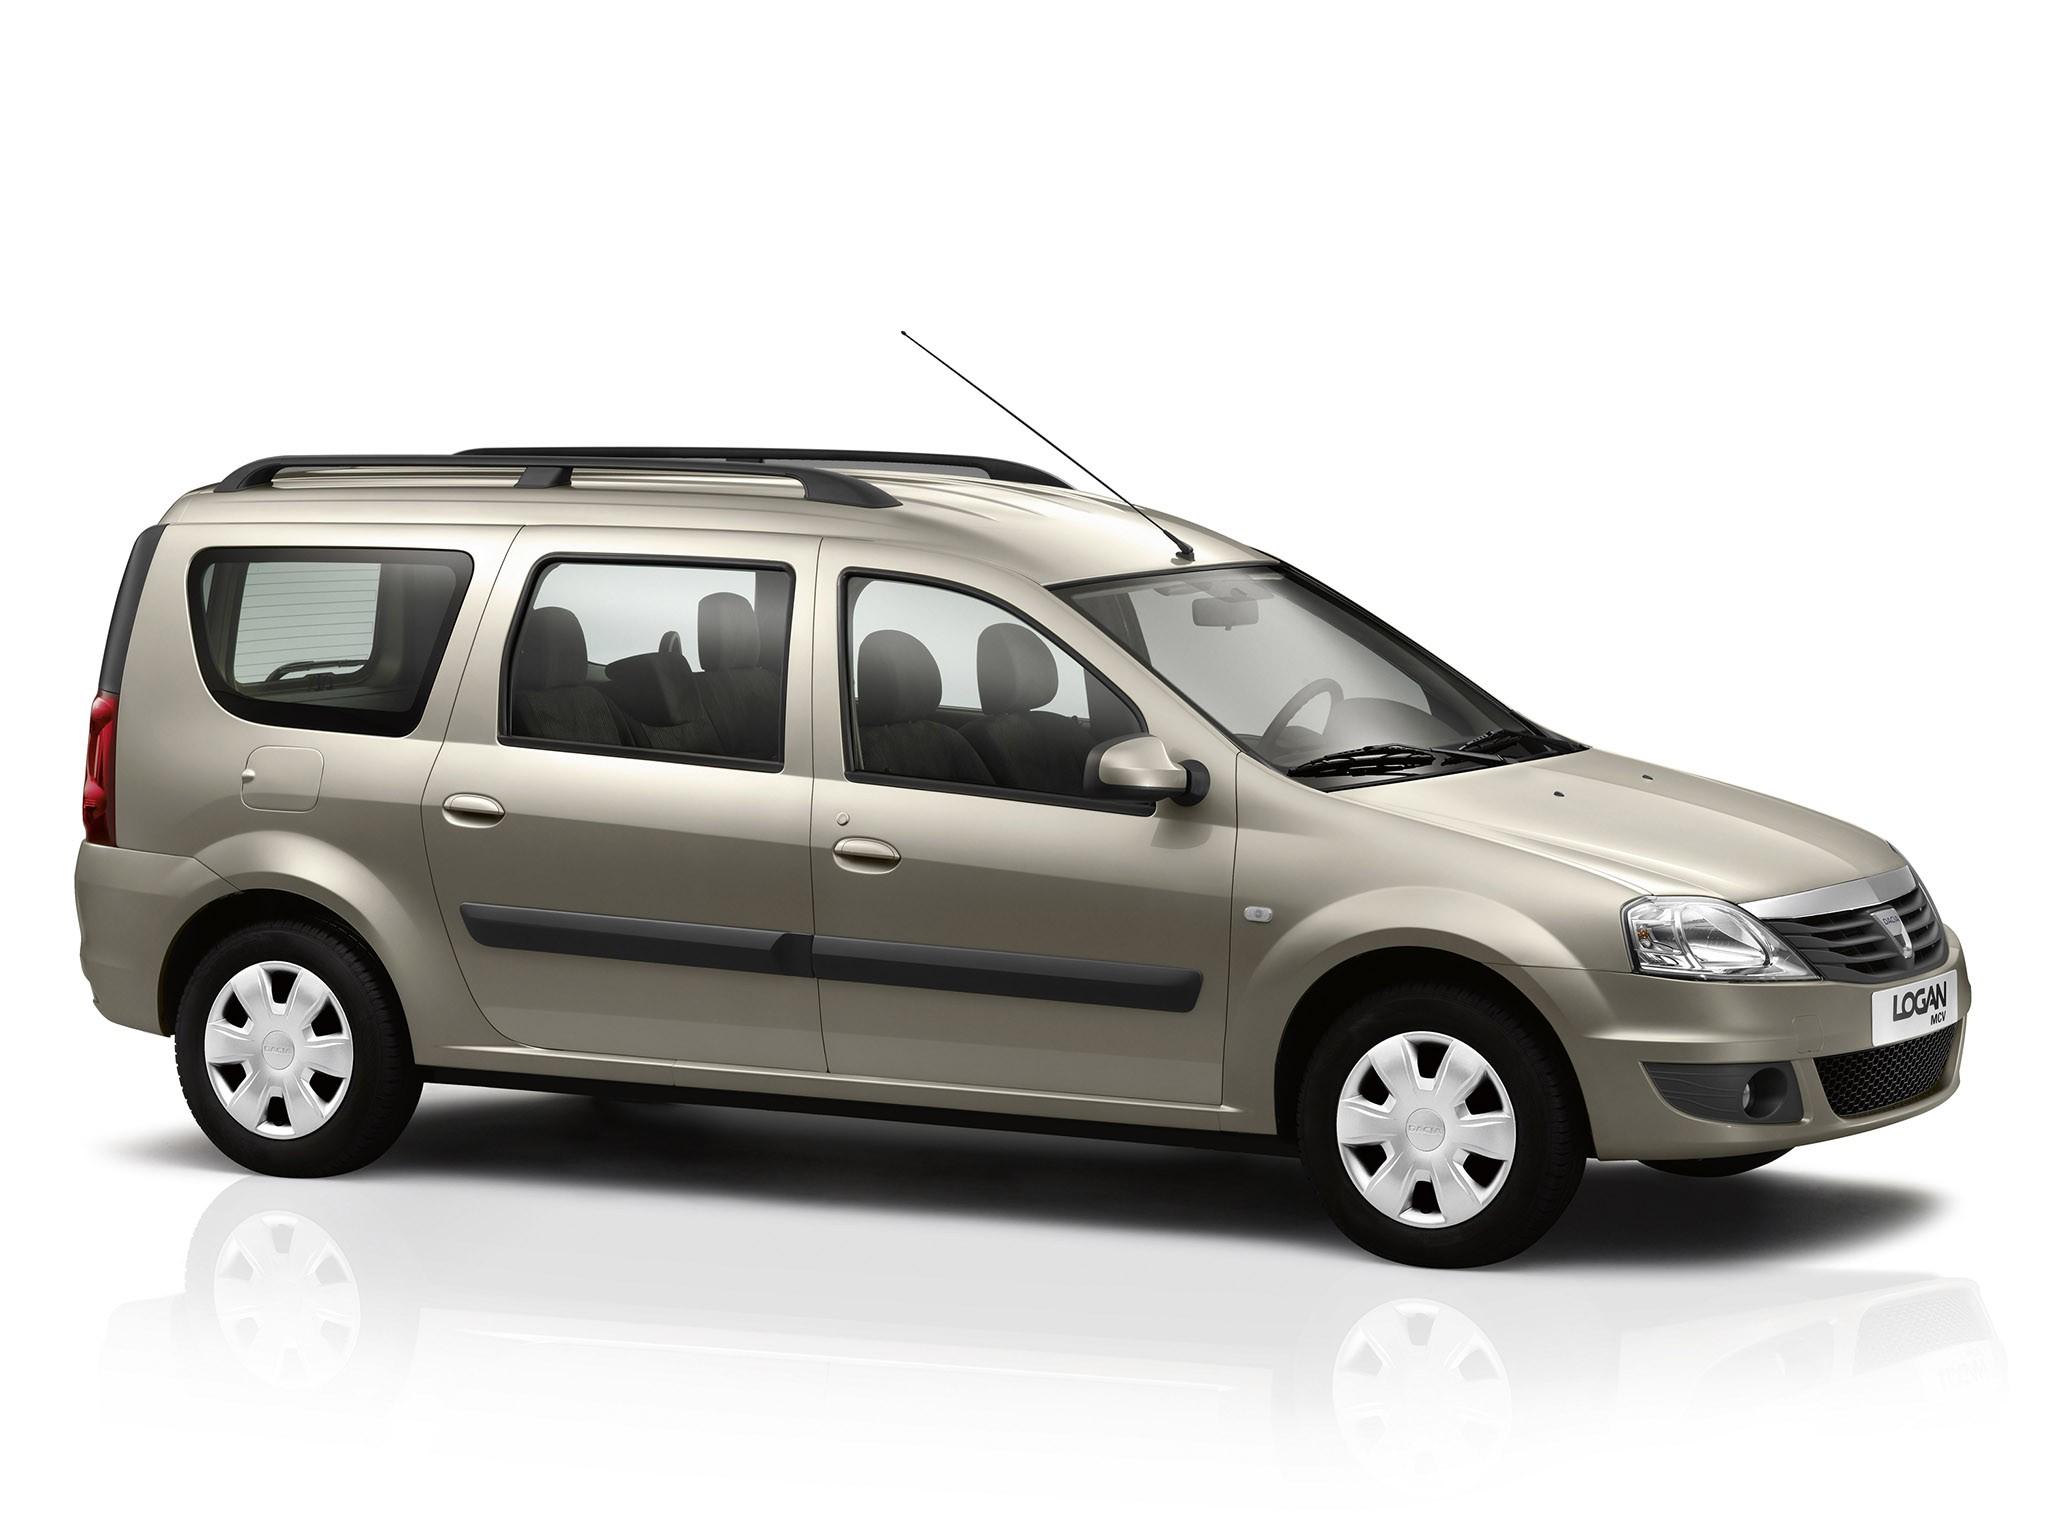 Dacia Logan Mcv Specs Amp Photos 2008 2009 2010 2011 2012 Autoevolution